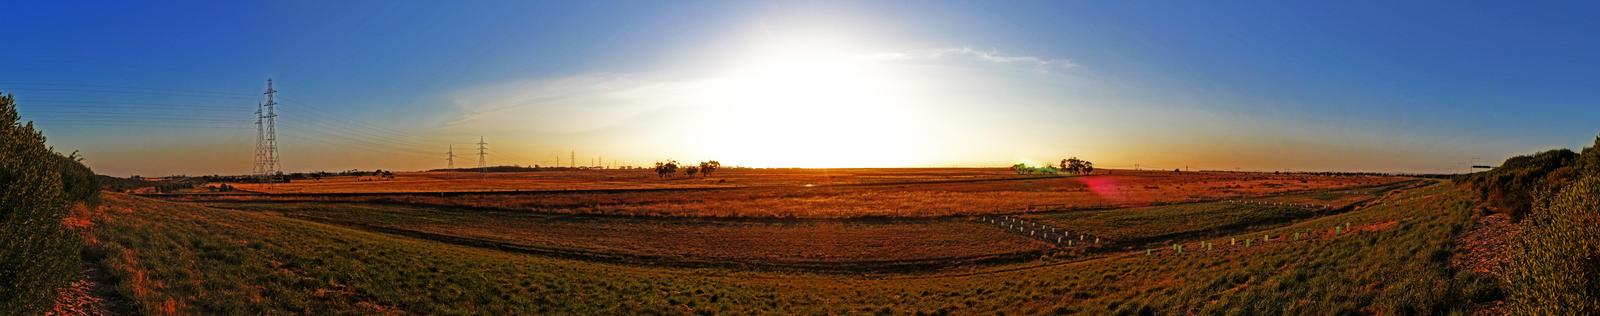 Melton sunset by WIIGII